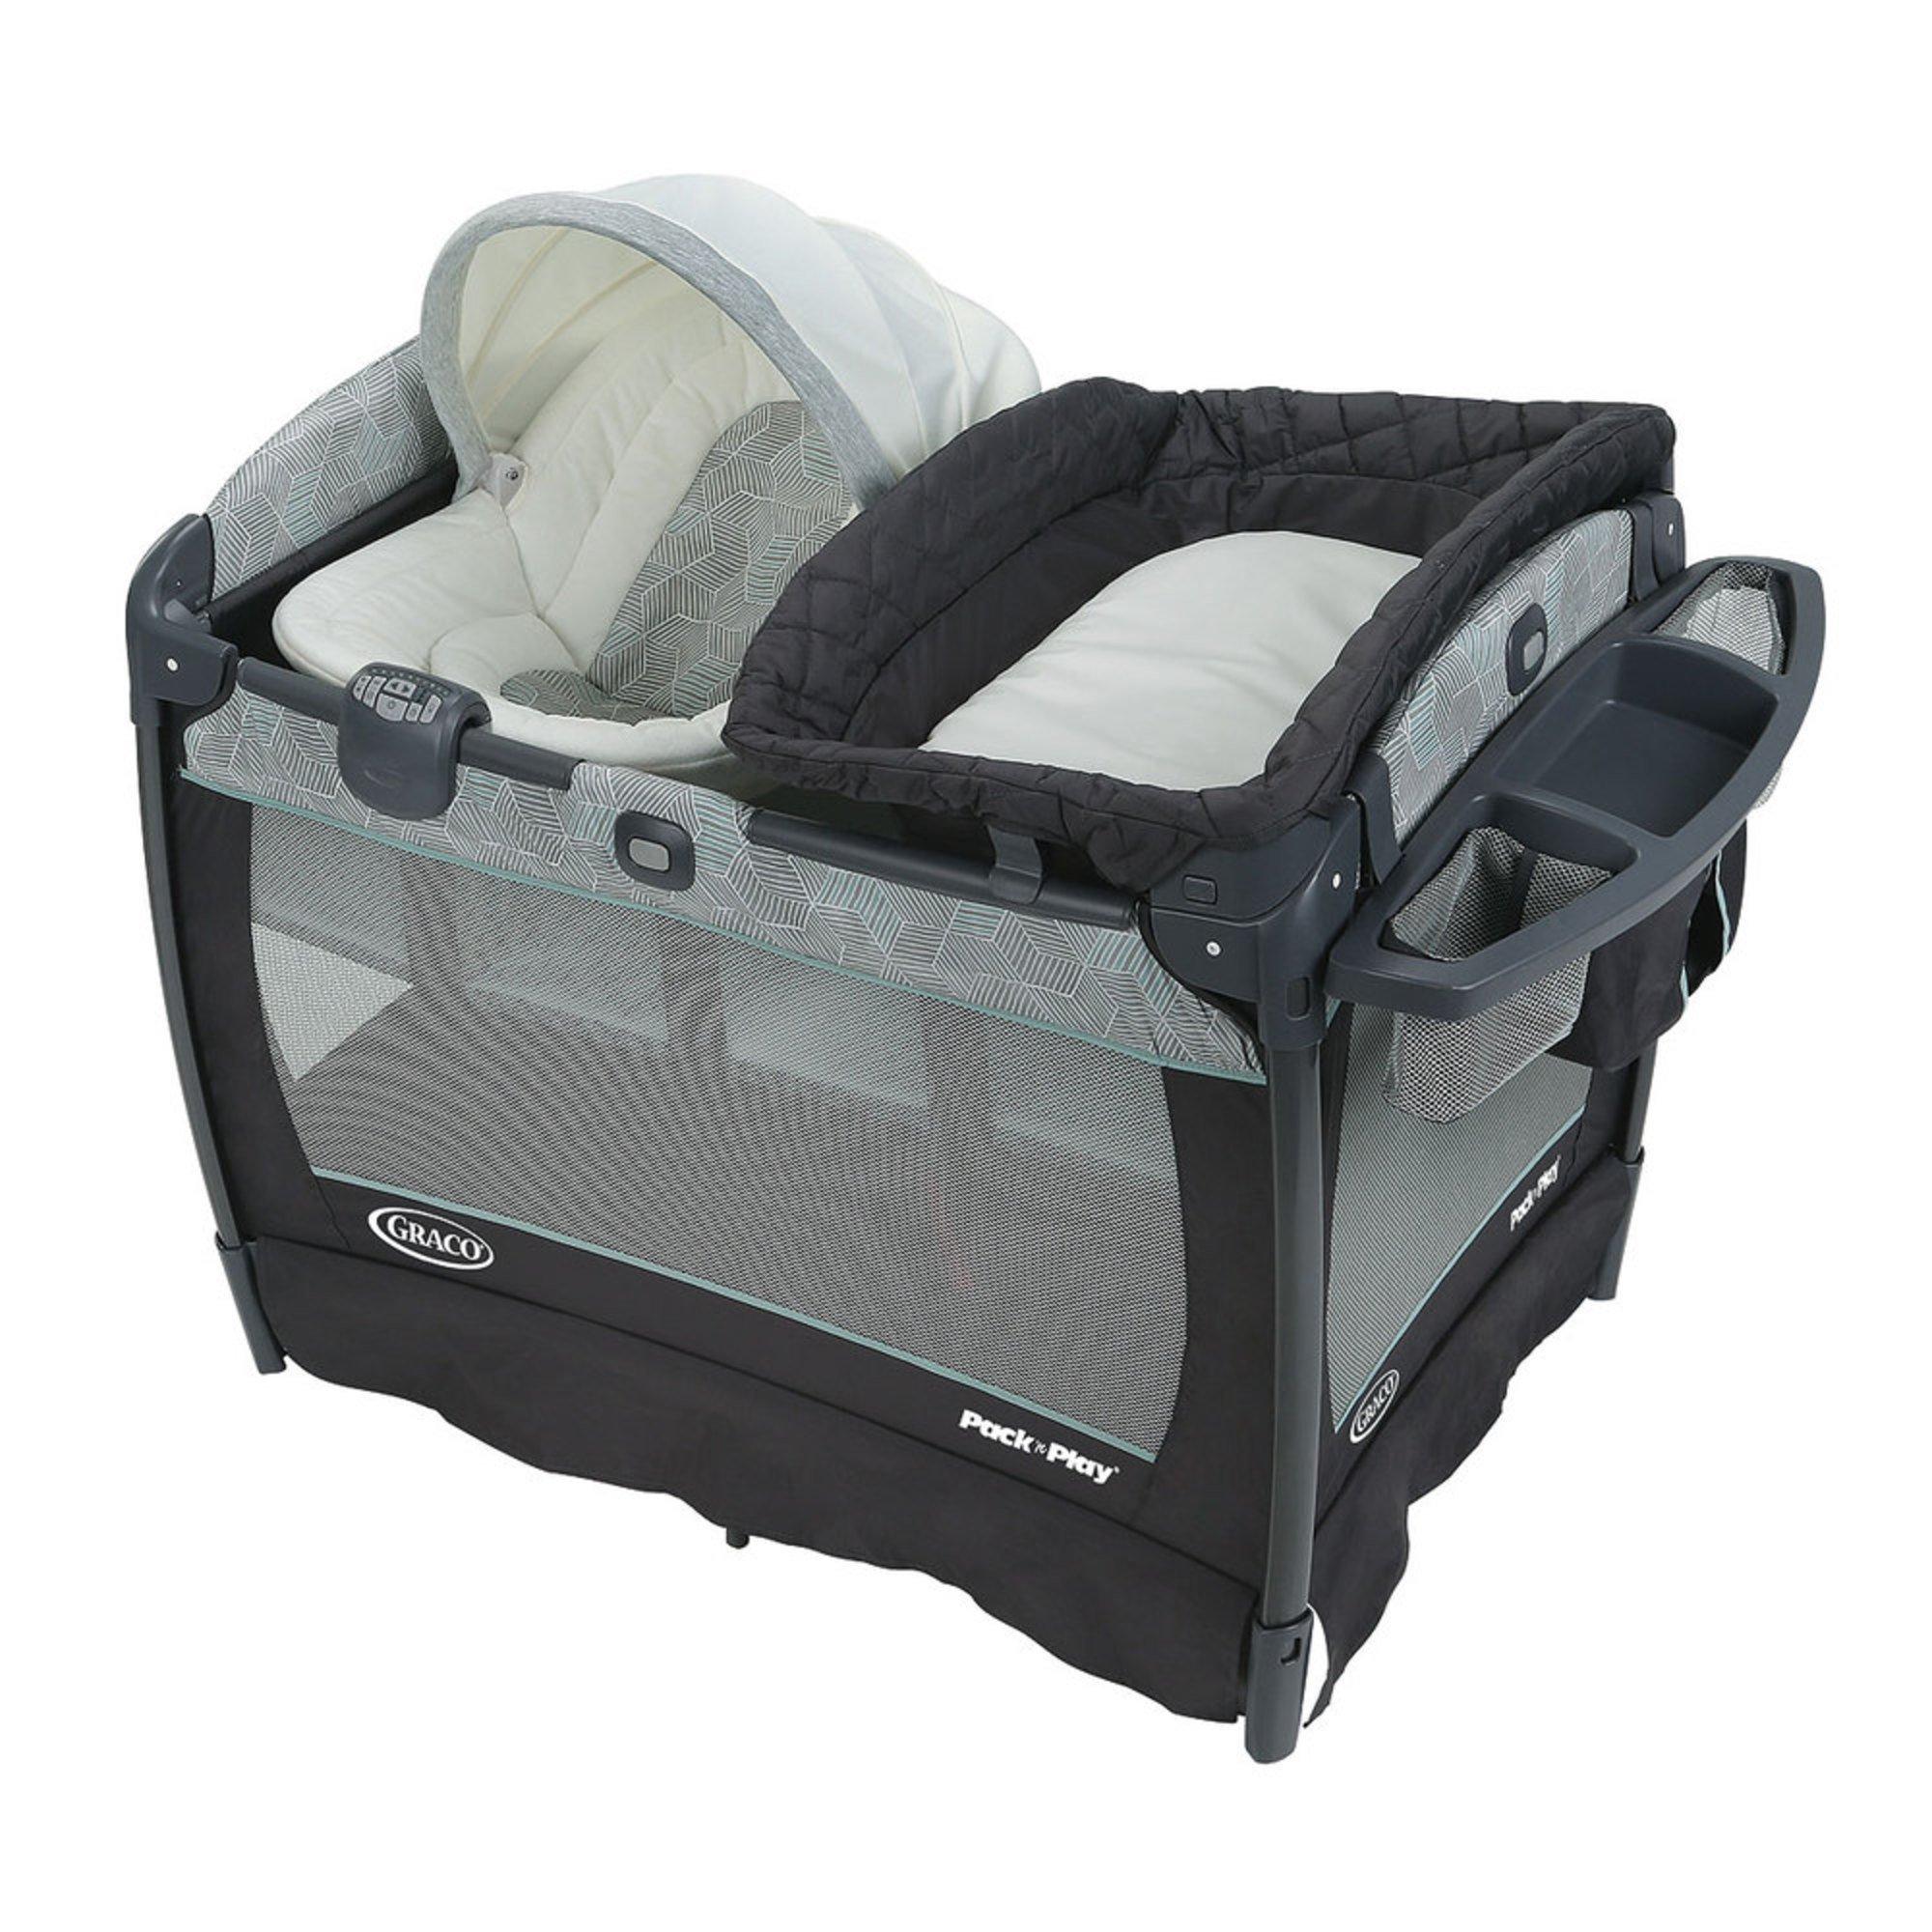 30d7611eb75e3 Graco Pack  n Play Playard With Newborn Napper Playard   Surround ...